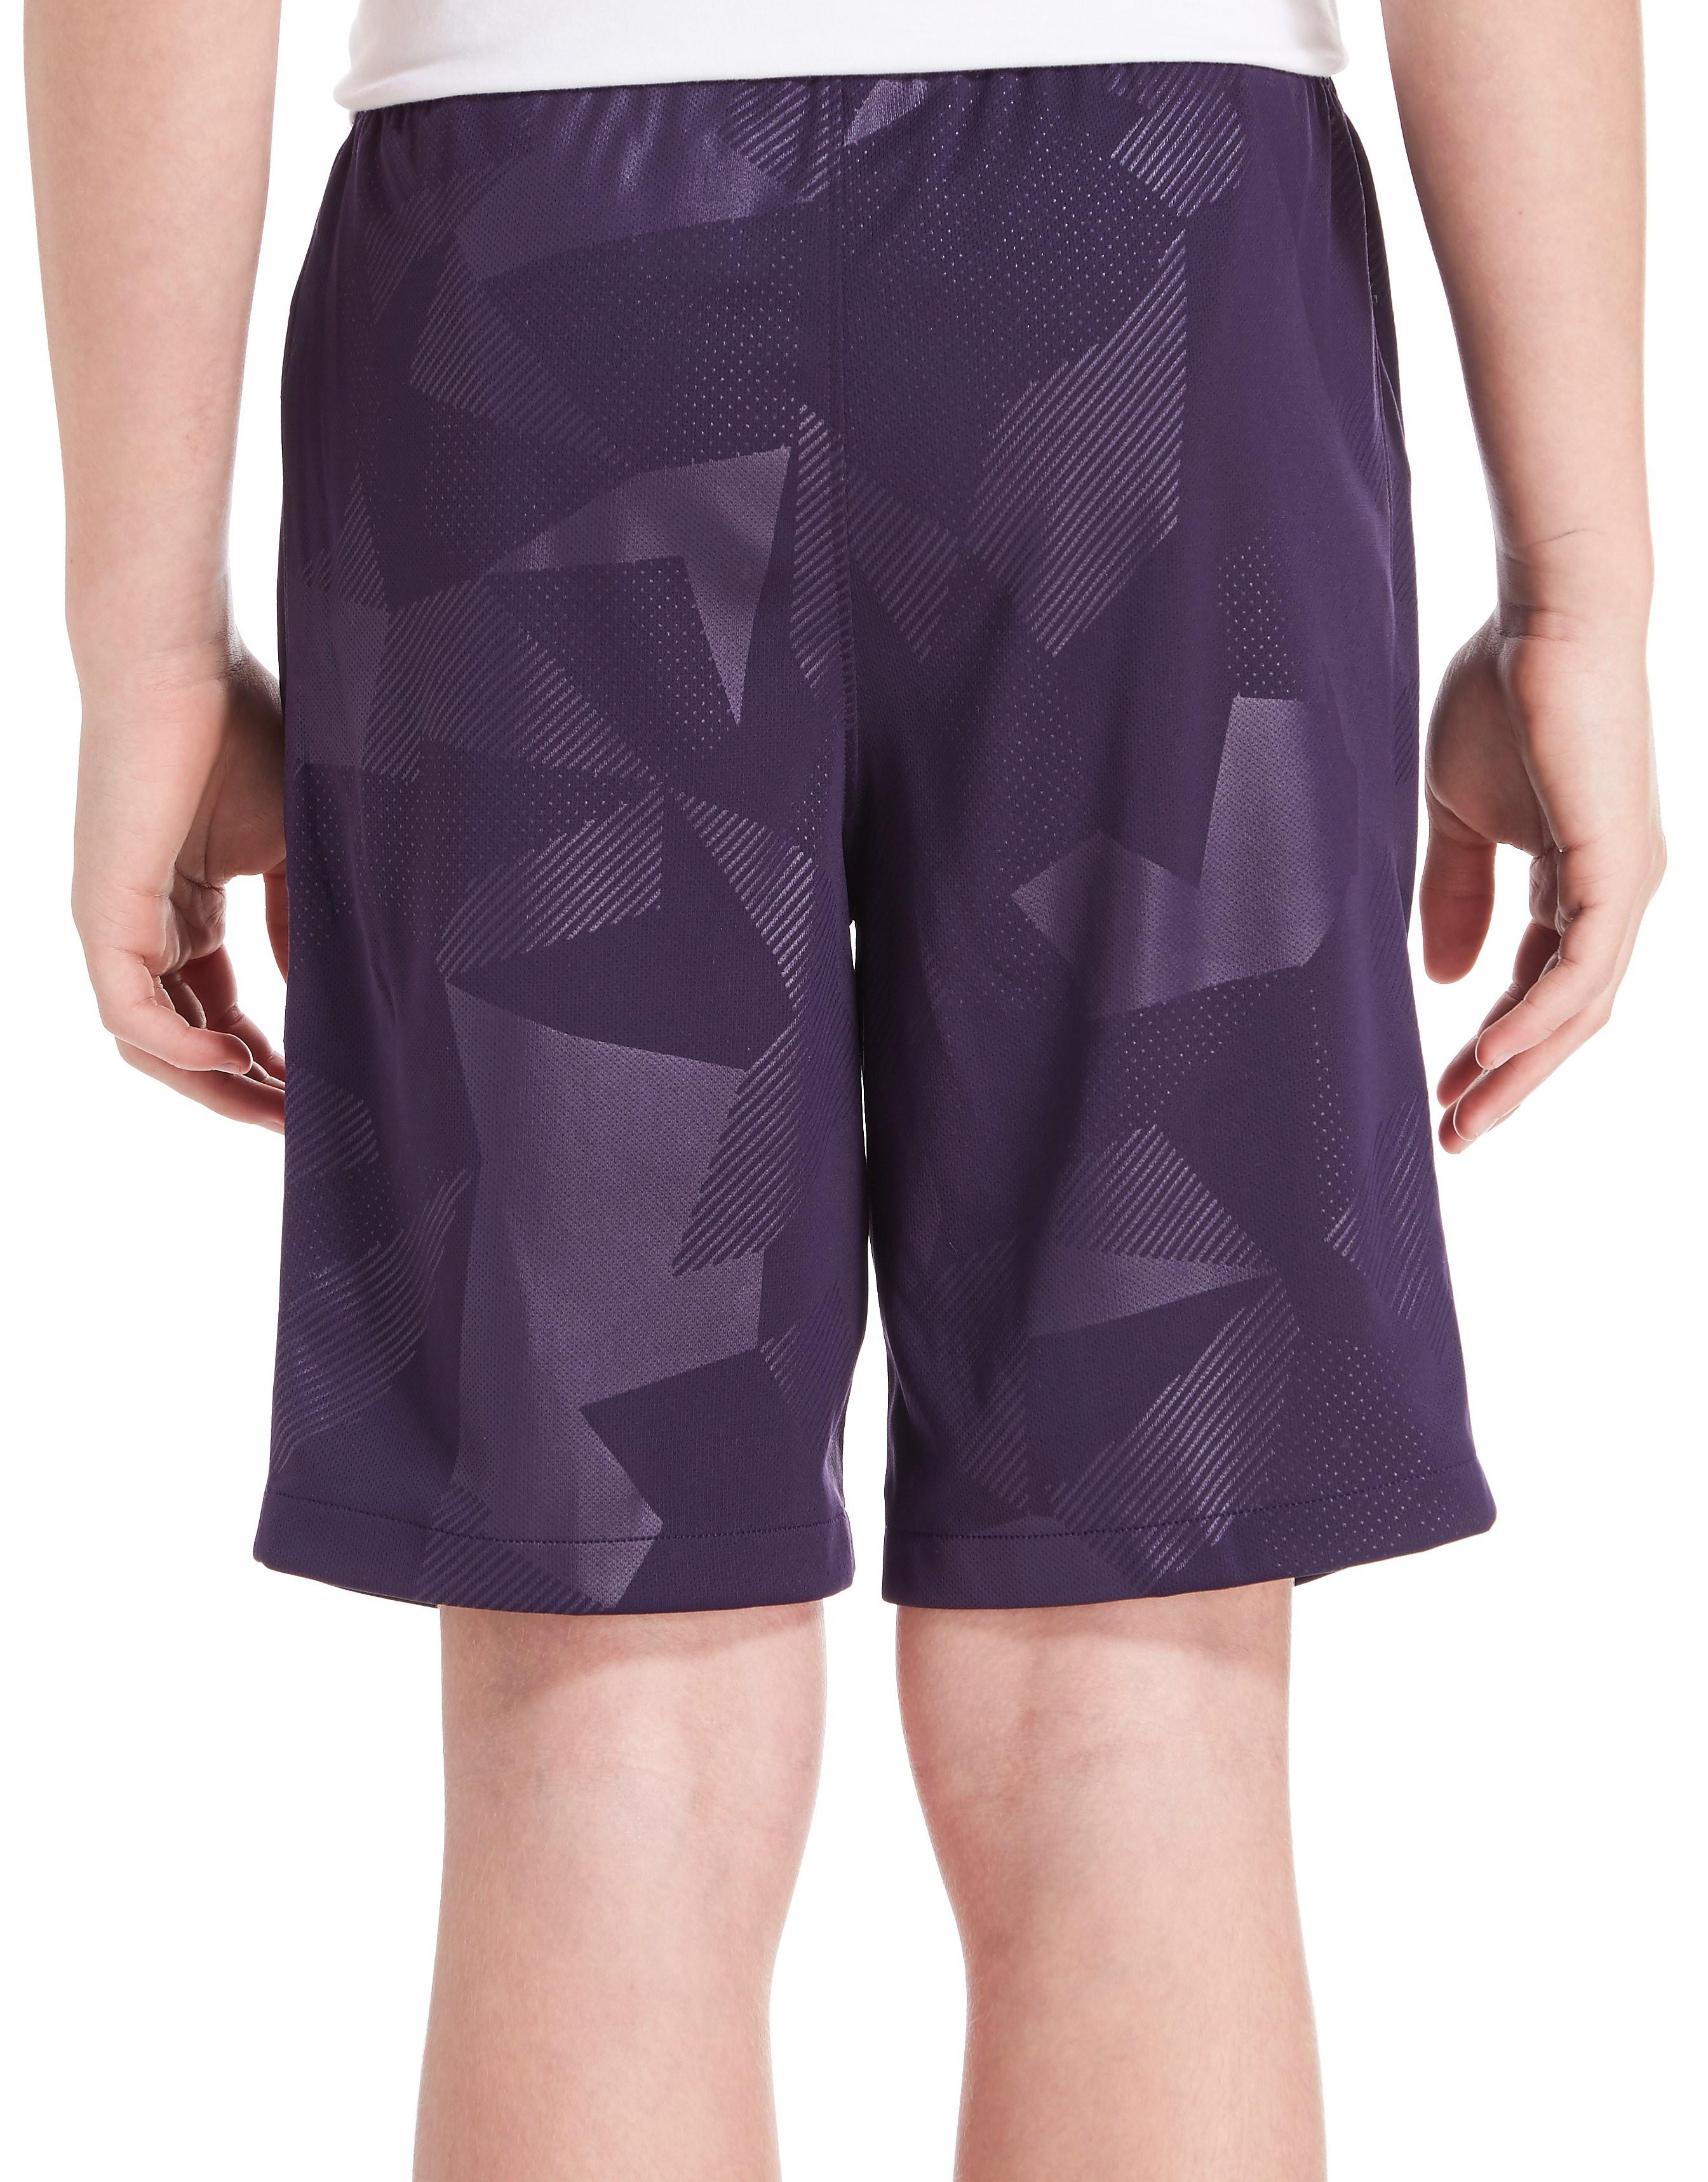 Nike Tottenham Hotspur 2017/18 Third Shorts Junior PRE